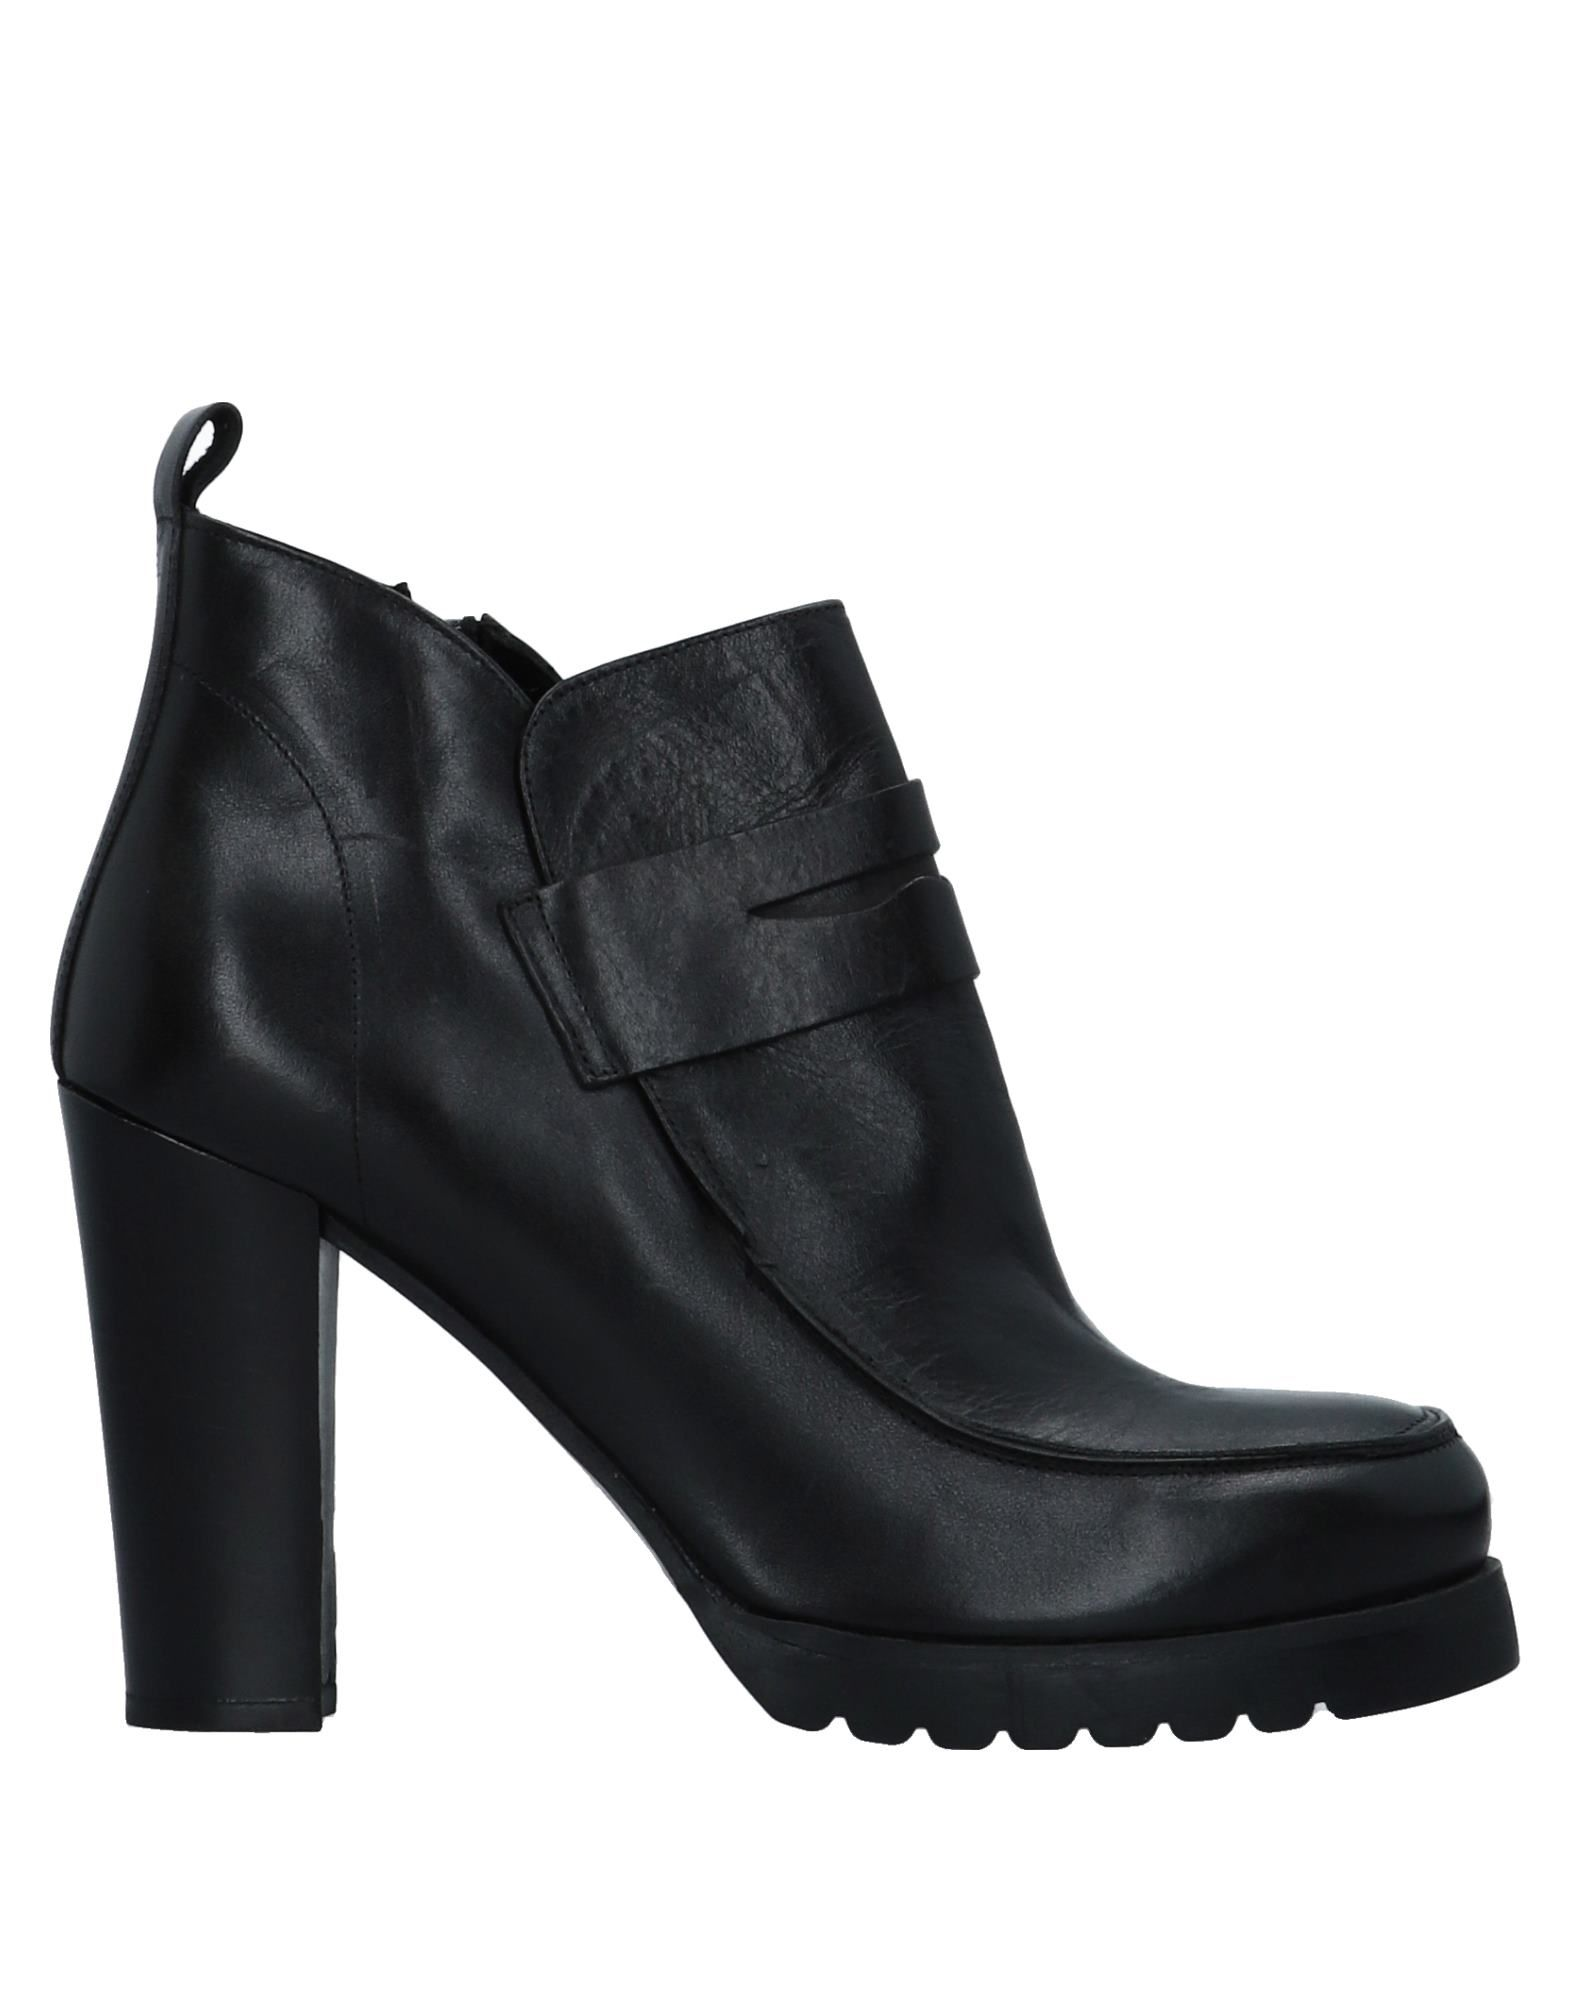 Paolina Perez Stiefelette Damen  11533837UL Gute Qualität beliebte Schuhe